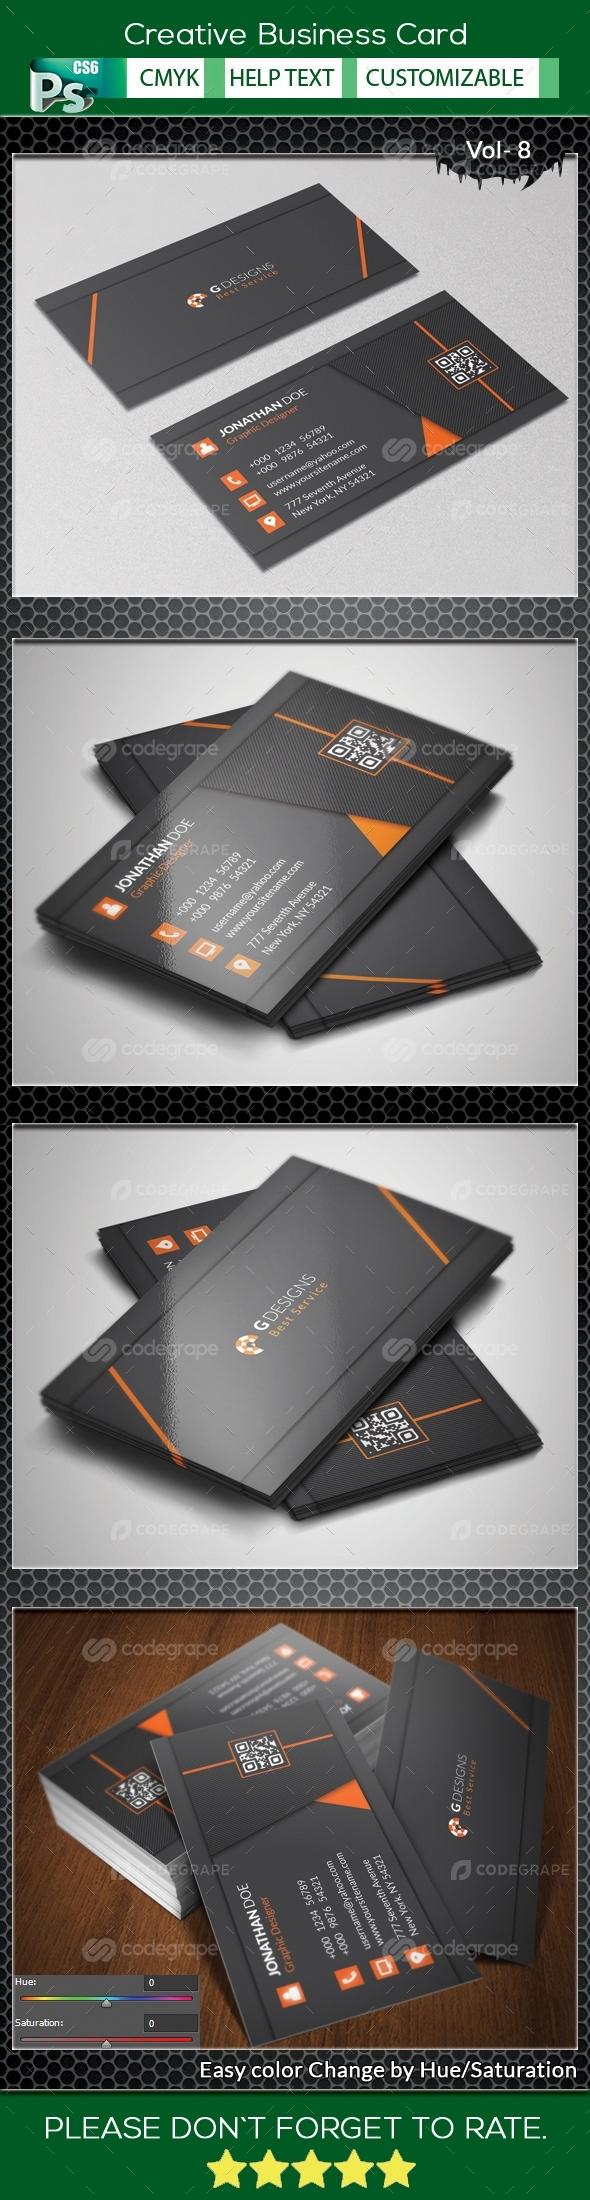 Creative Business Card V.8